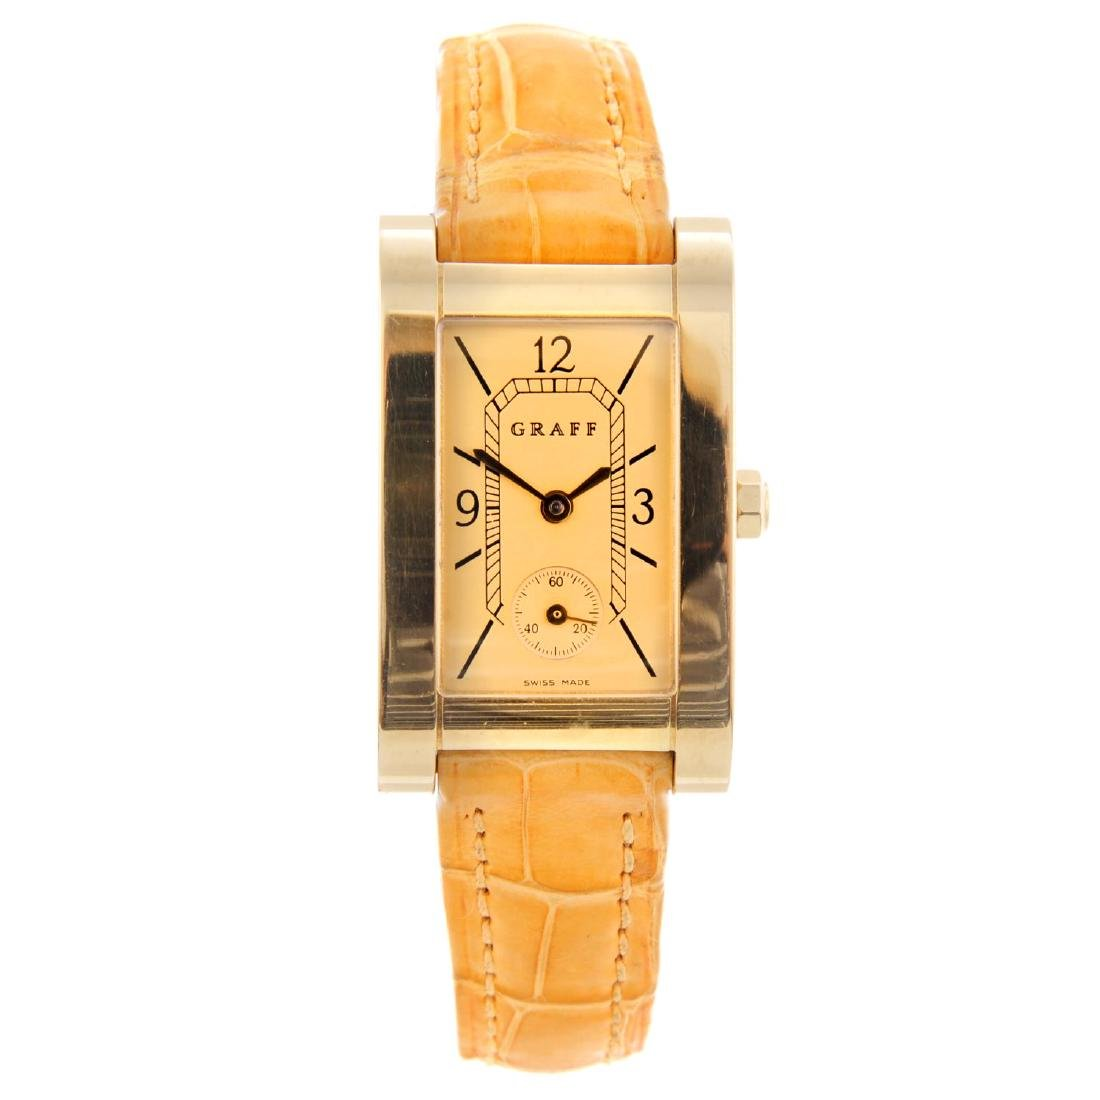 GRAFF - a lady's wrist watch. 18ct yellow gold case.